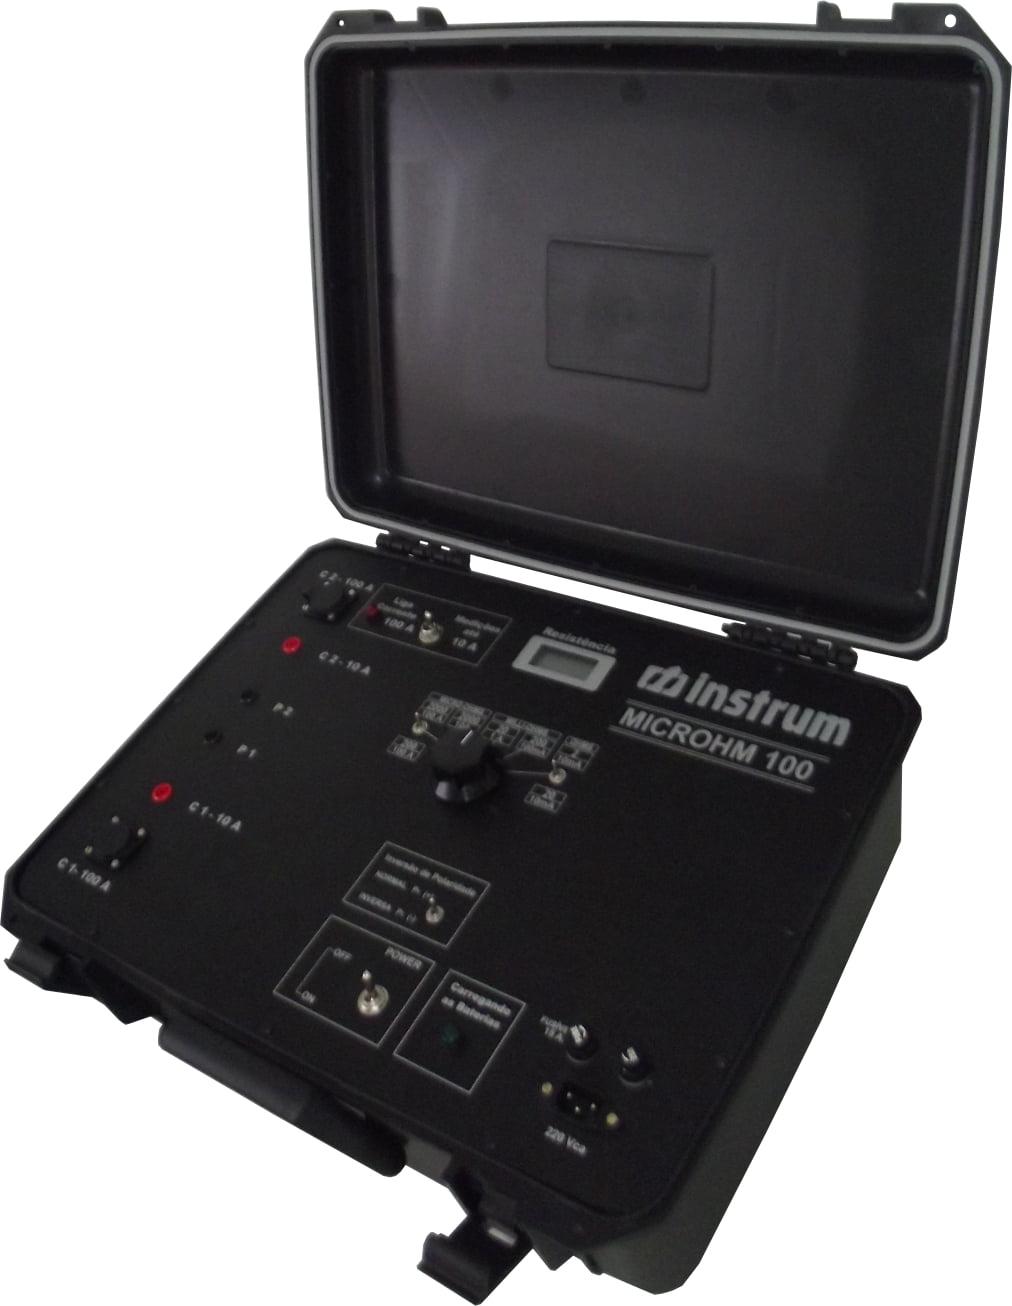 Micro-Ohmímetro Digital 100A Modelo: MICROHM-100 Marca: INSTRUM